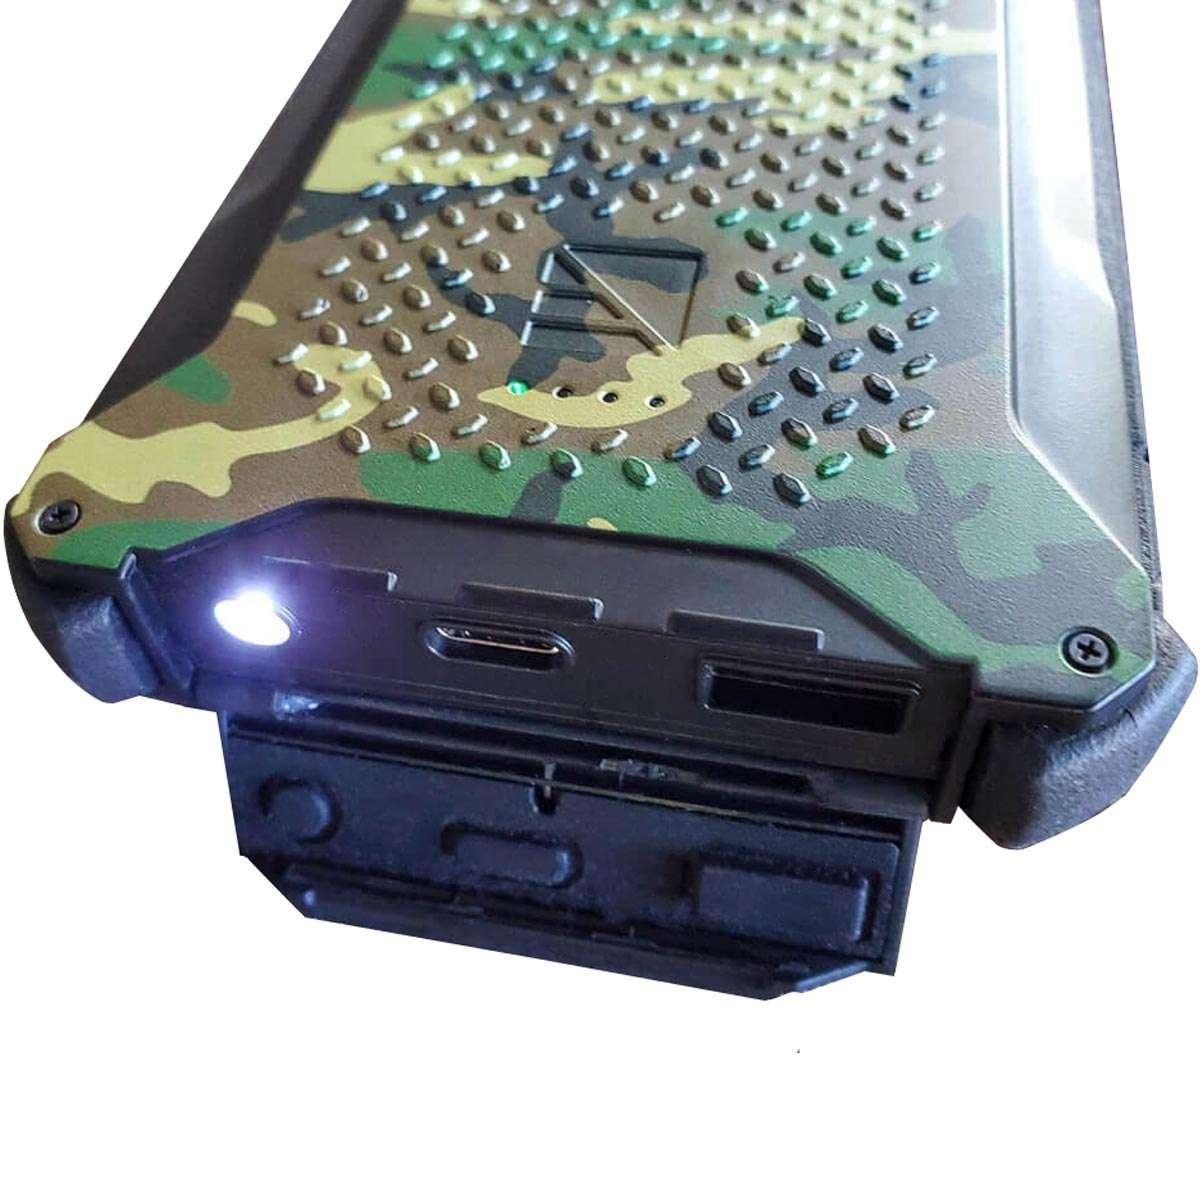 Dark Energy Poseidon PRO Power Bank Portable Charger Kit